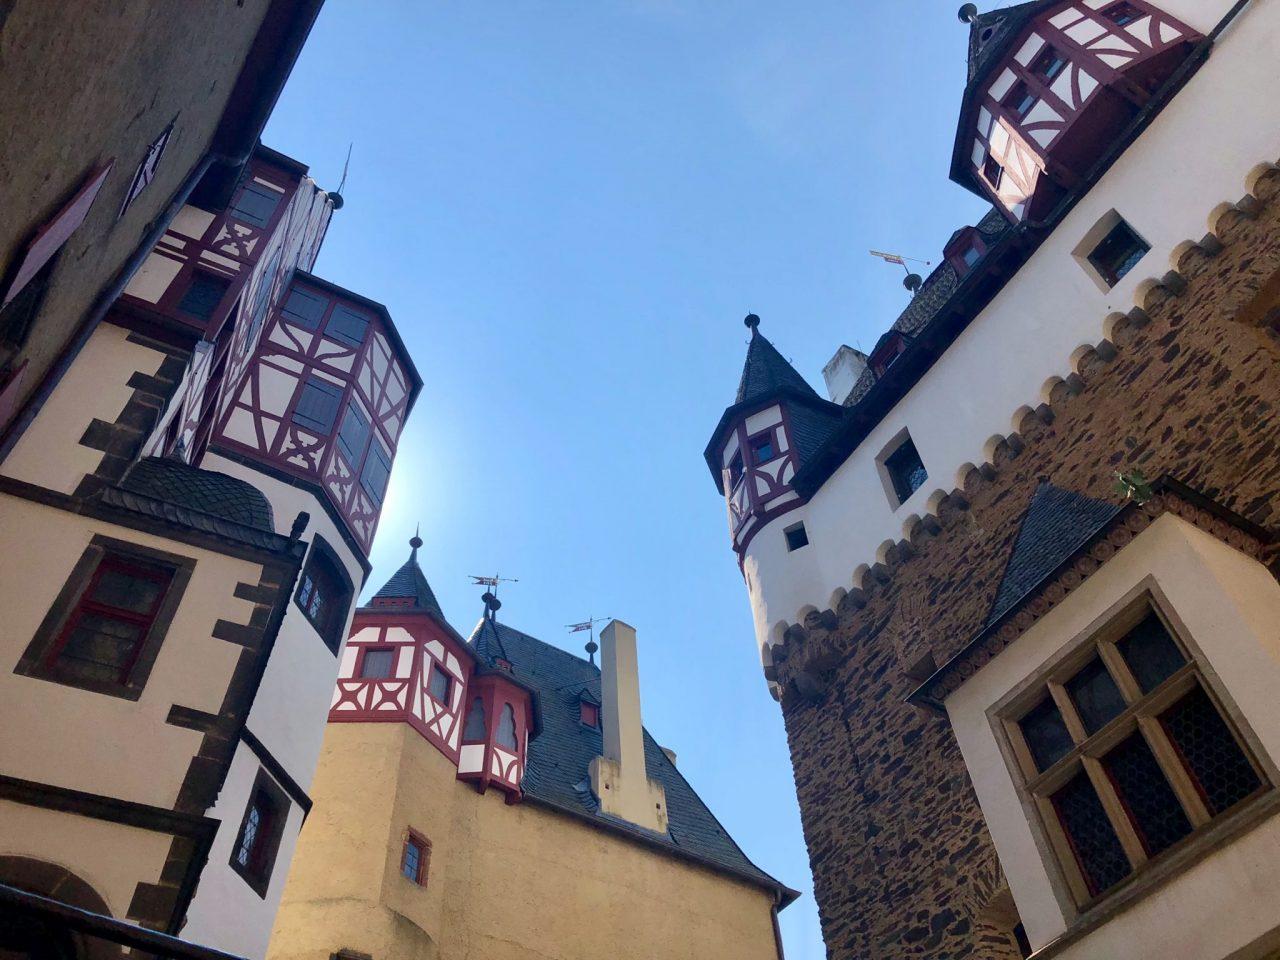 Burg Eltz castle courtyard